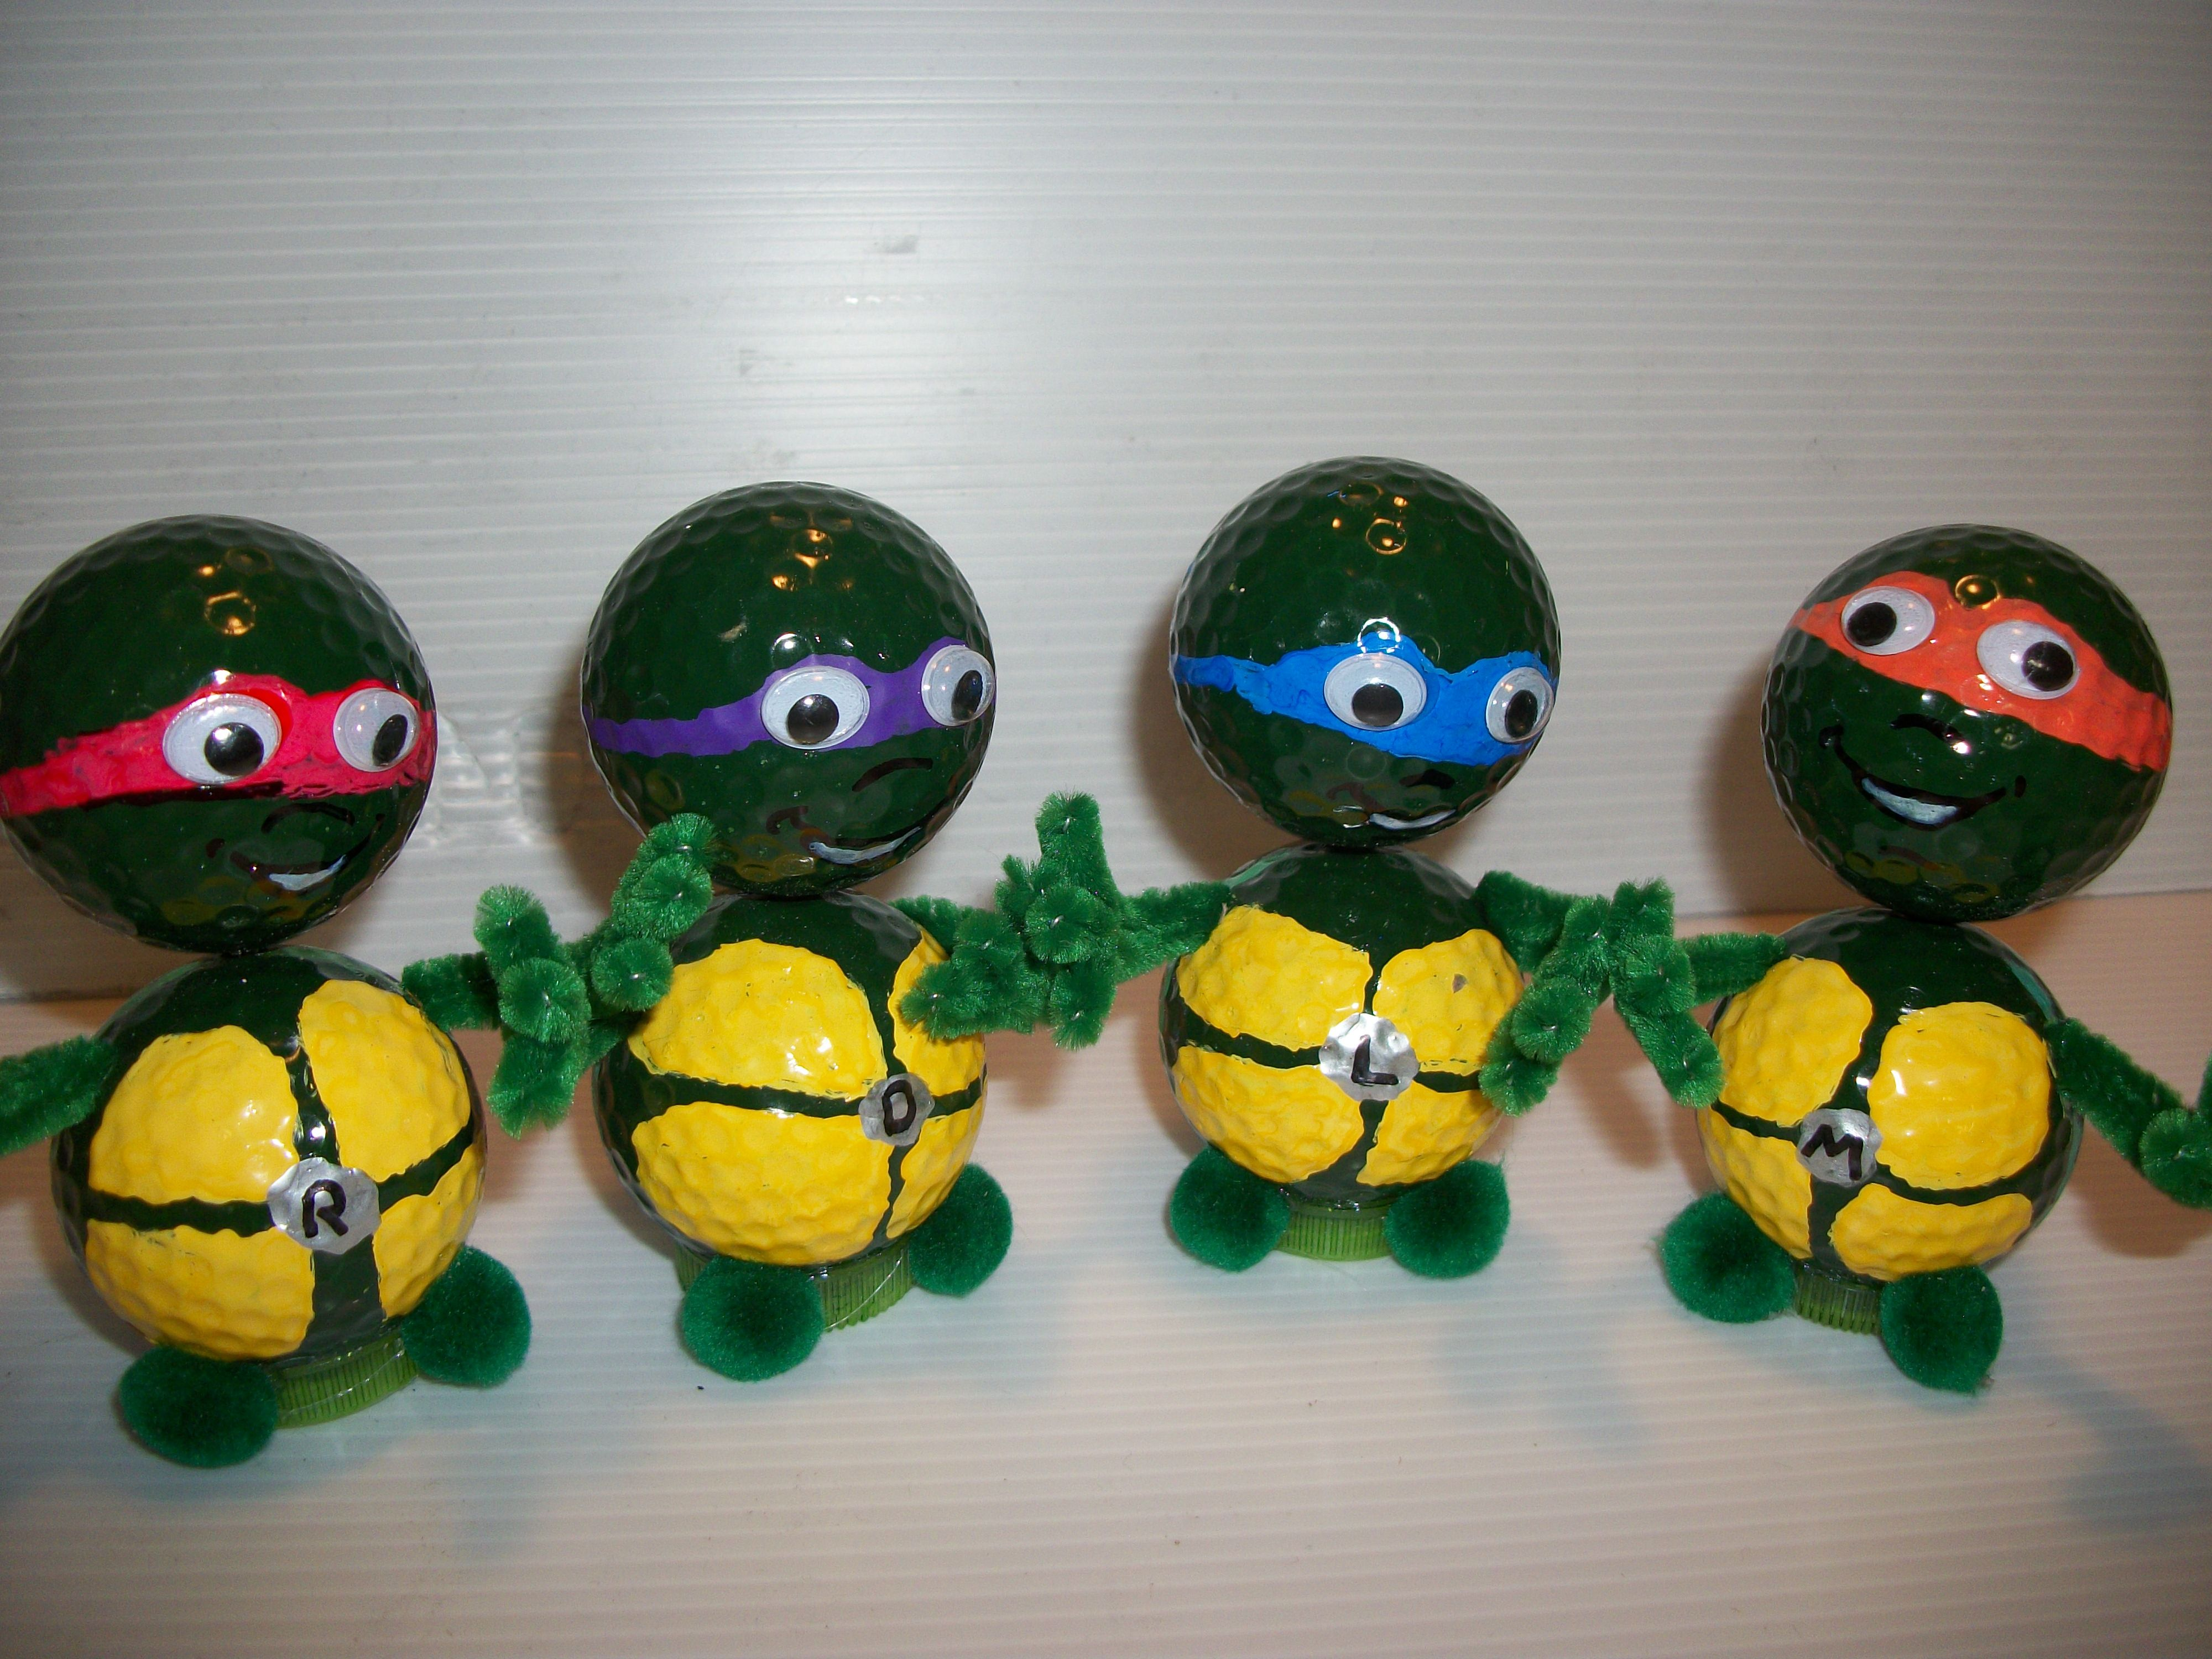 Ninja Turtles Crafts Golf Crafts Golf Ball Crafts